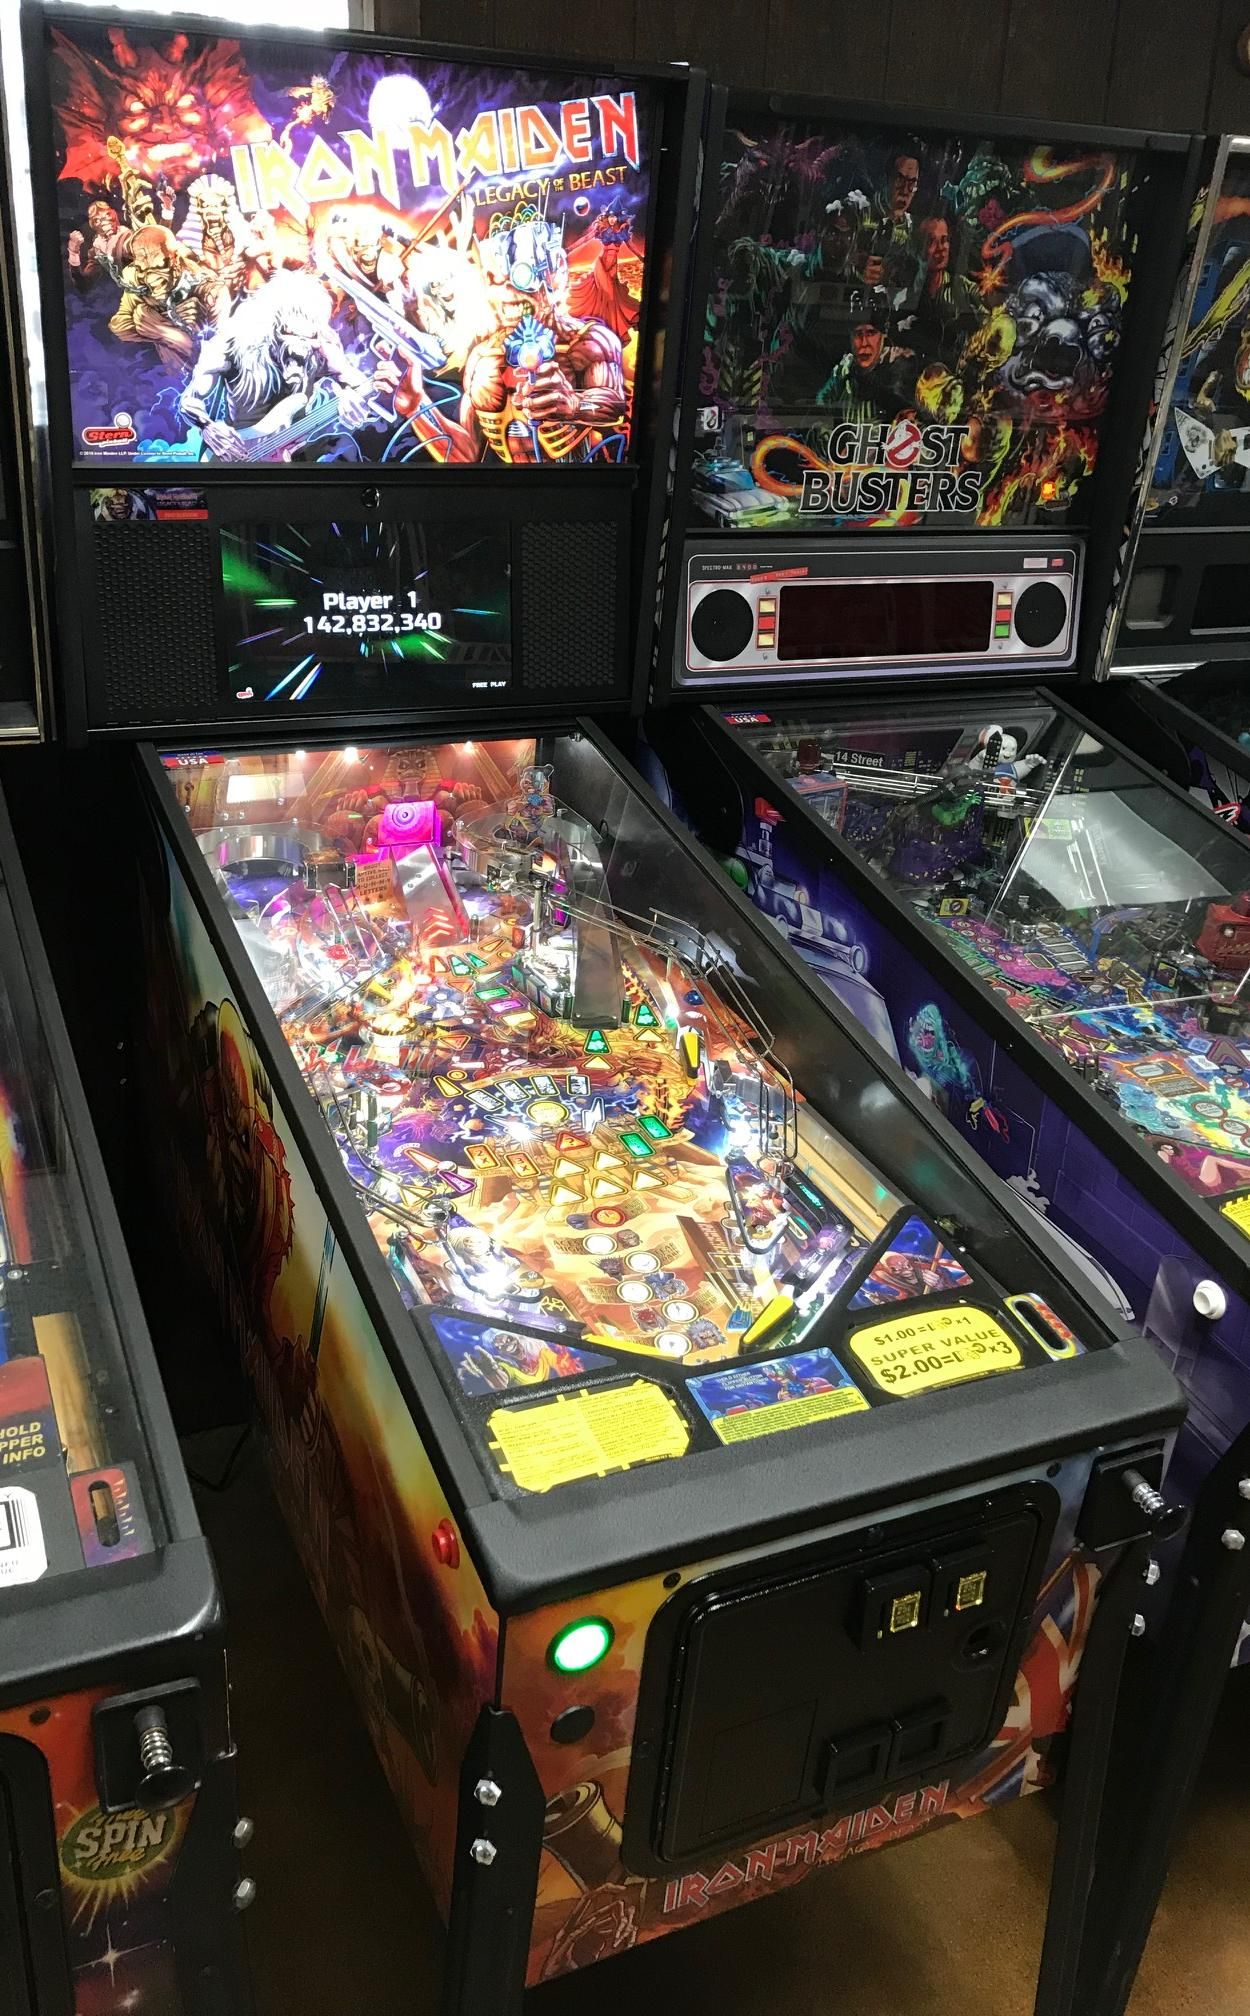 2018 Stern Iron Maiden at Ann Arbor Michigan Pinball Museum